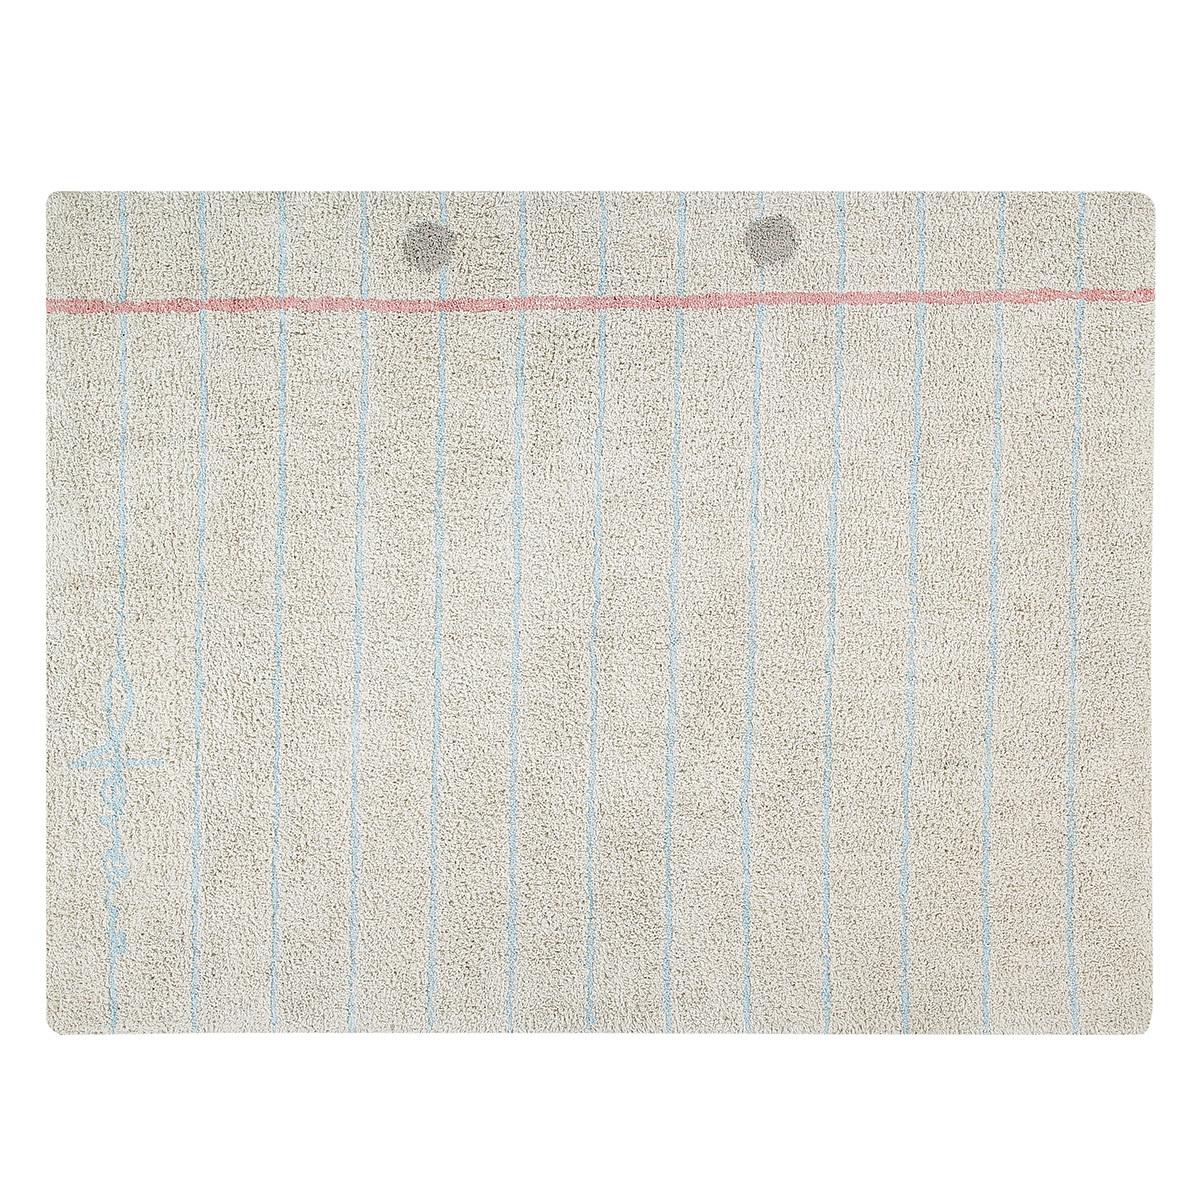 Tapis Tapis Lavable Notebook - 120 x 160 cm Tapis Lavable Notebook - 120 x 160 cm